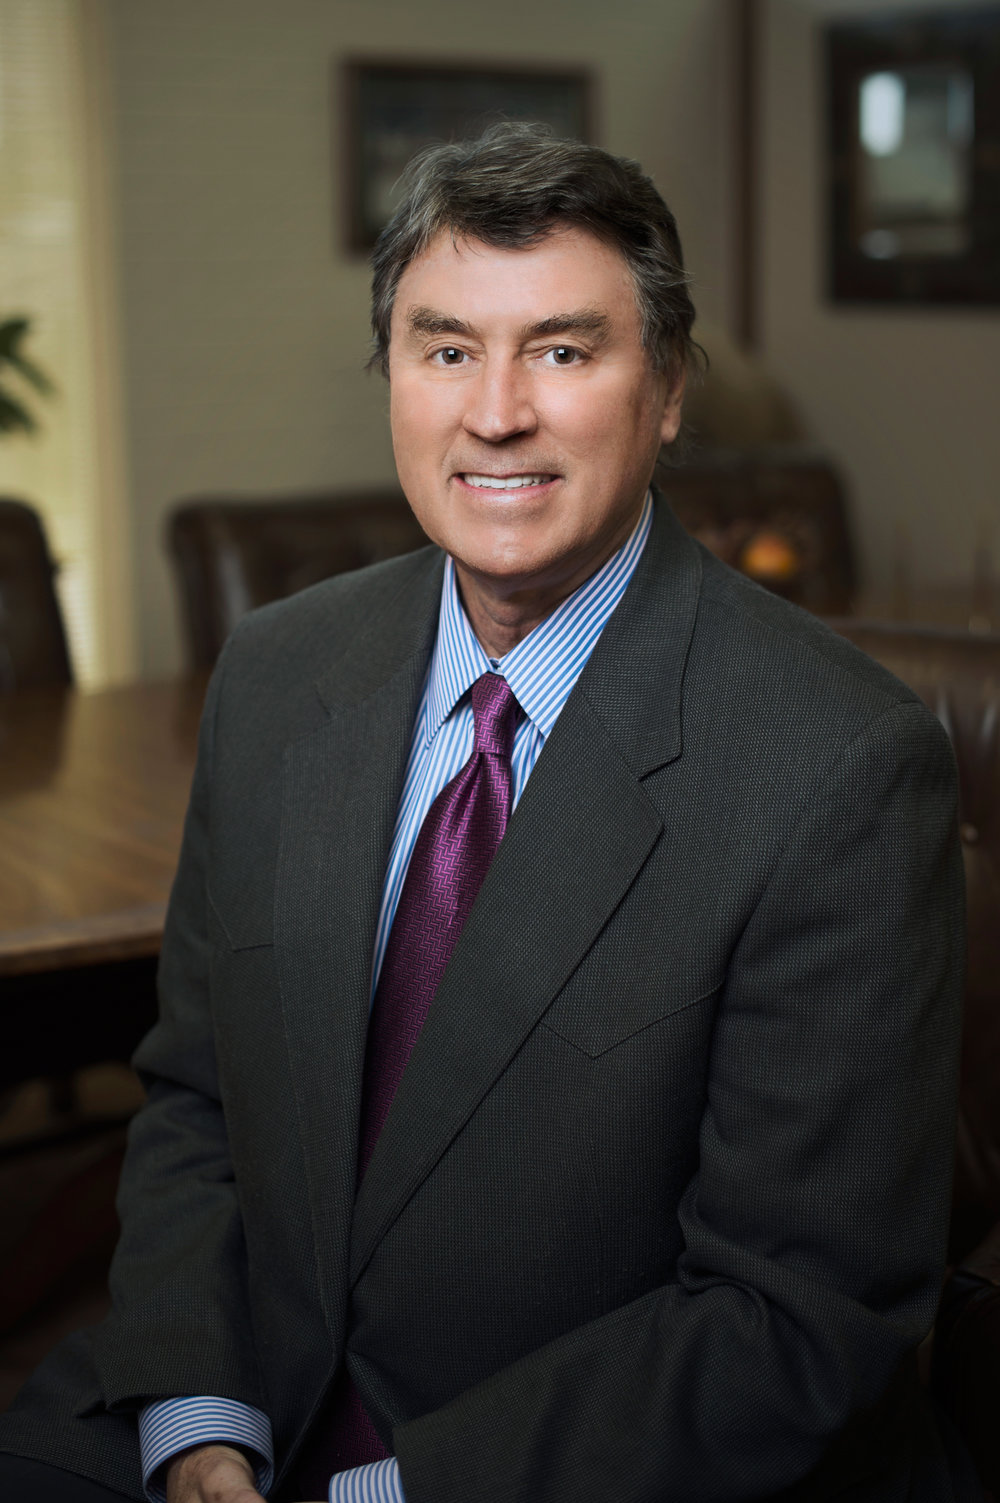 Skip Davidson - Attorney at Law